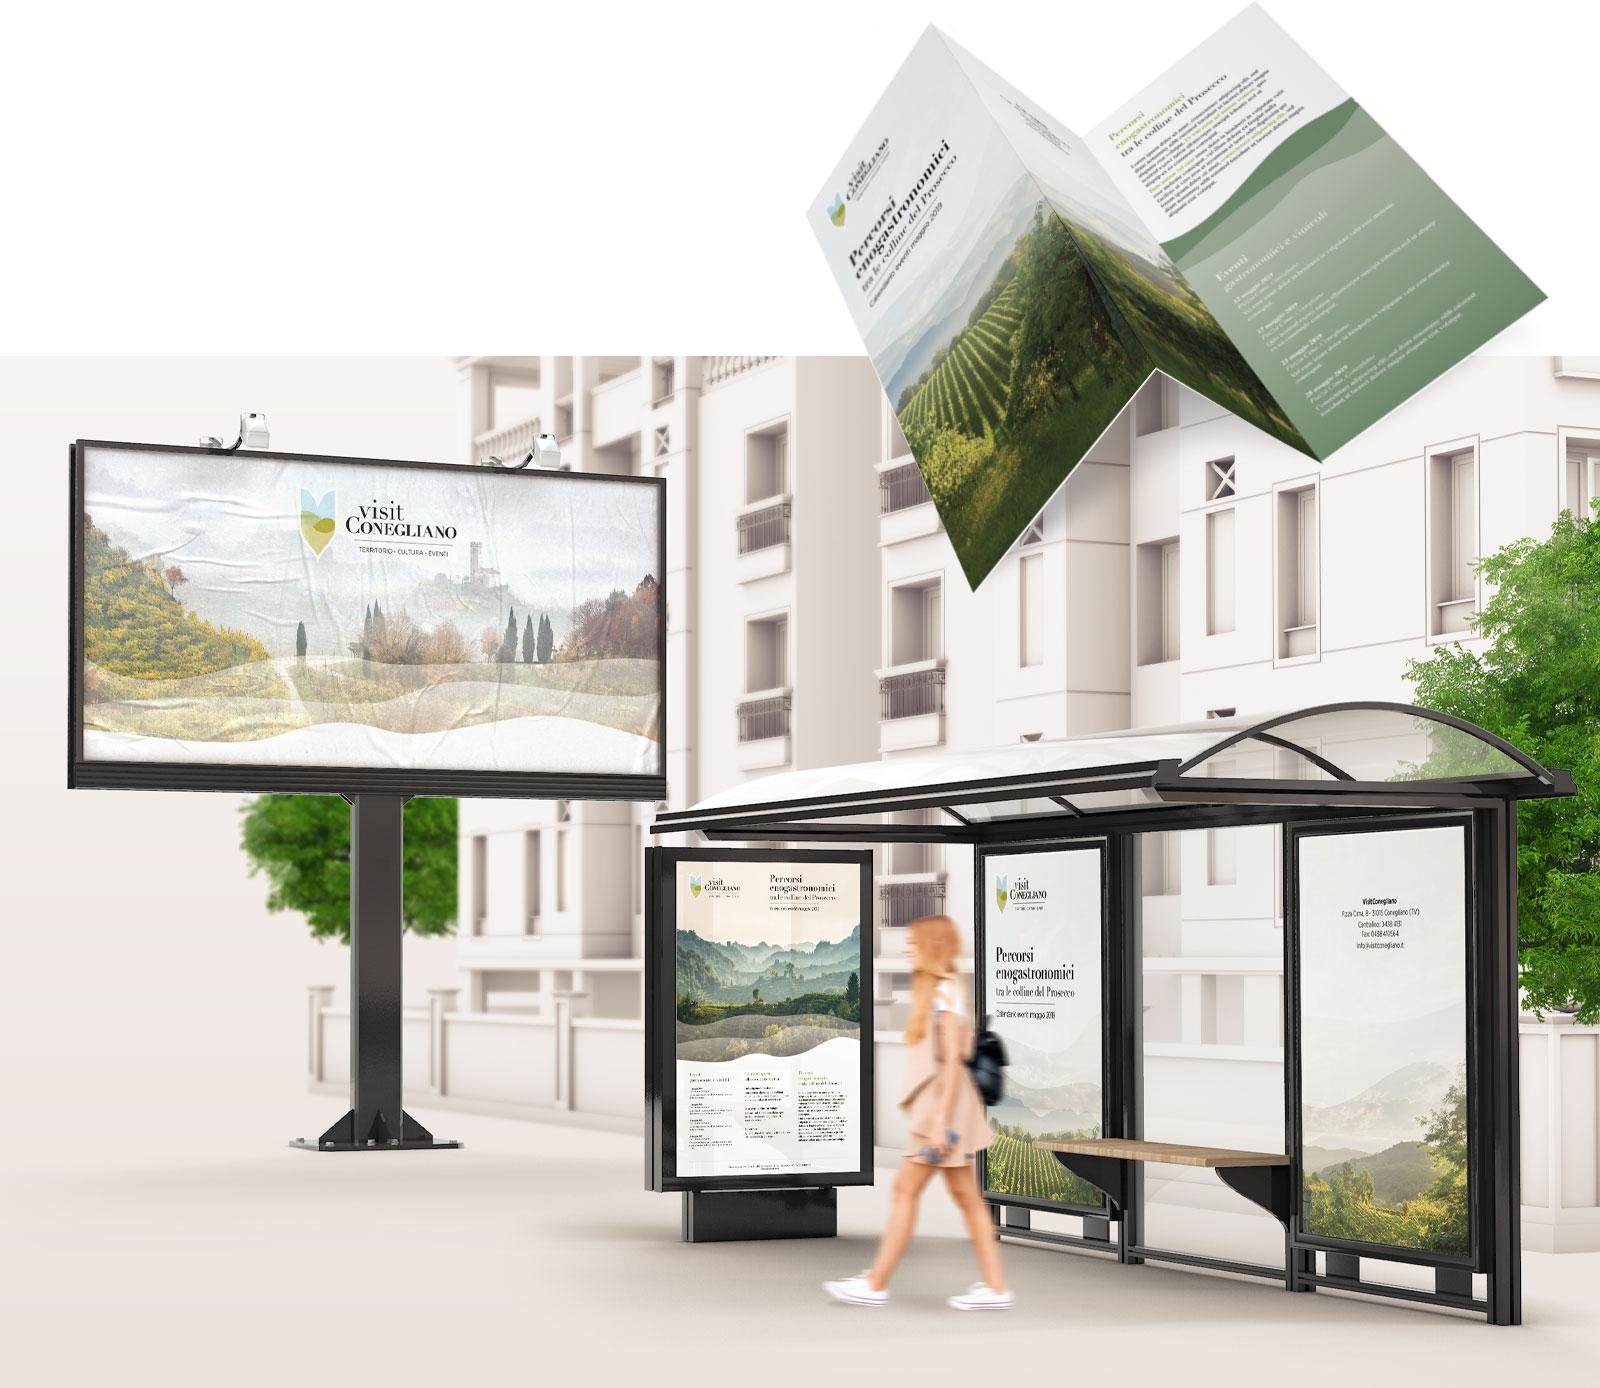 visit-conegliano-advertising